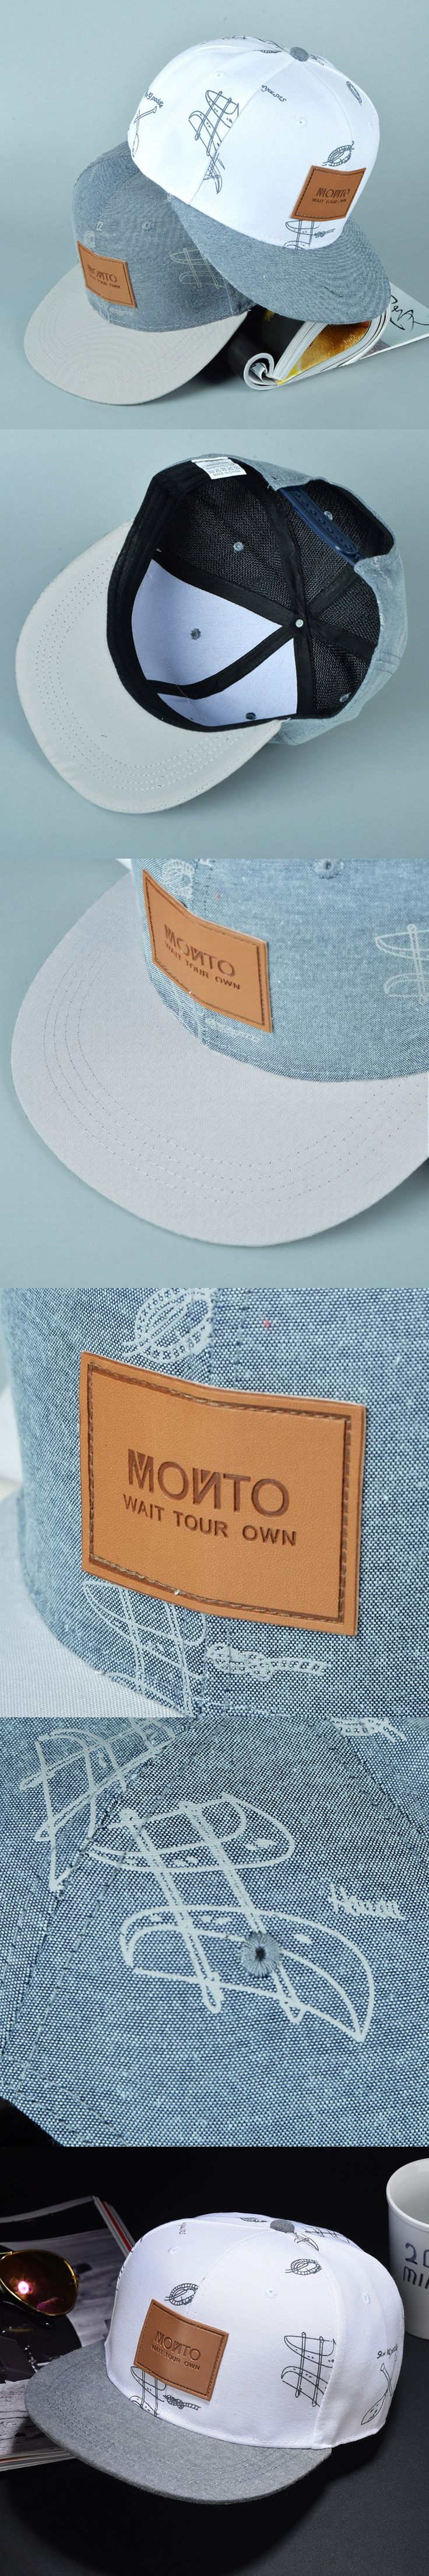 2016 New Name Brand Mens Snapback Cap Hats Women Sports Adjust Baseball Cap Nice Cheap Hip Hop Hats Branded Label Bone Gorras